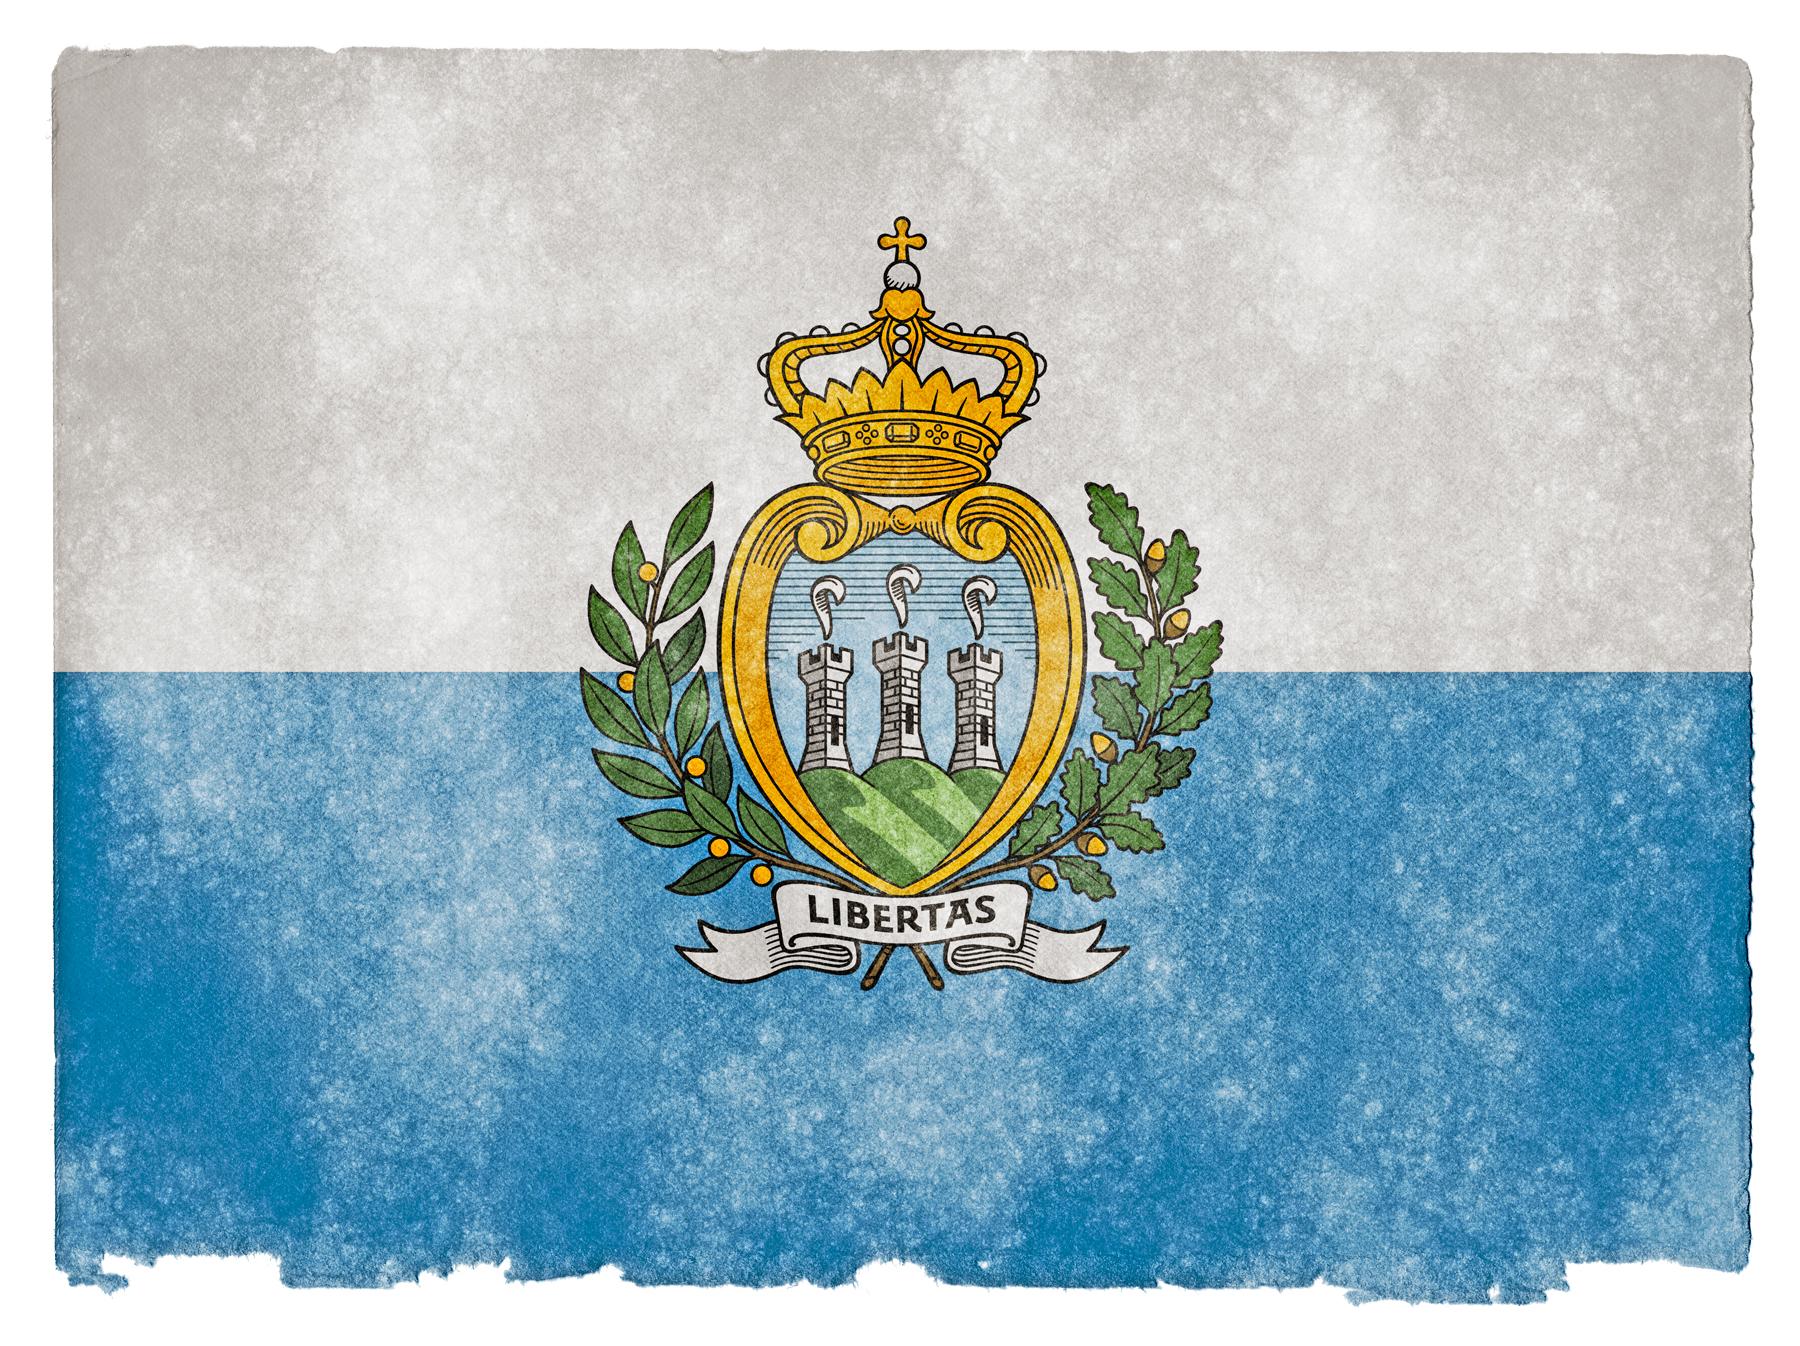 stockvault-san-marino-grunge-flag134387